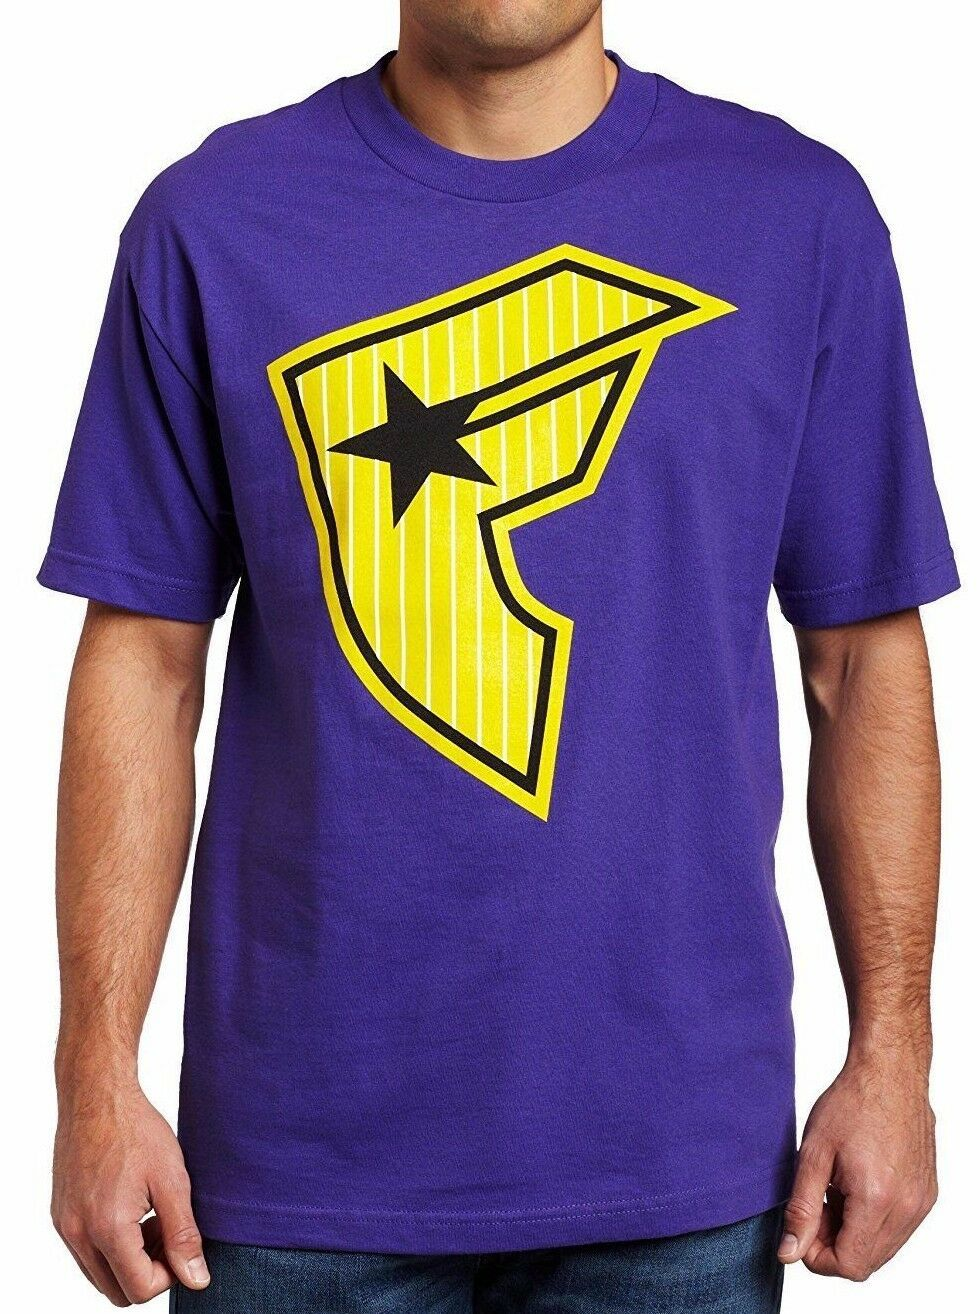 Famous Stars & Straps Purple Yellow Men's Classic Stripe BOH T-Shirt Small NWT